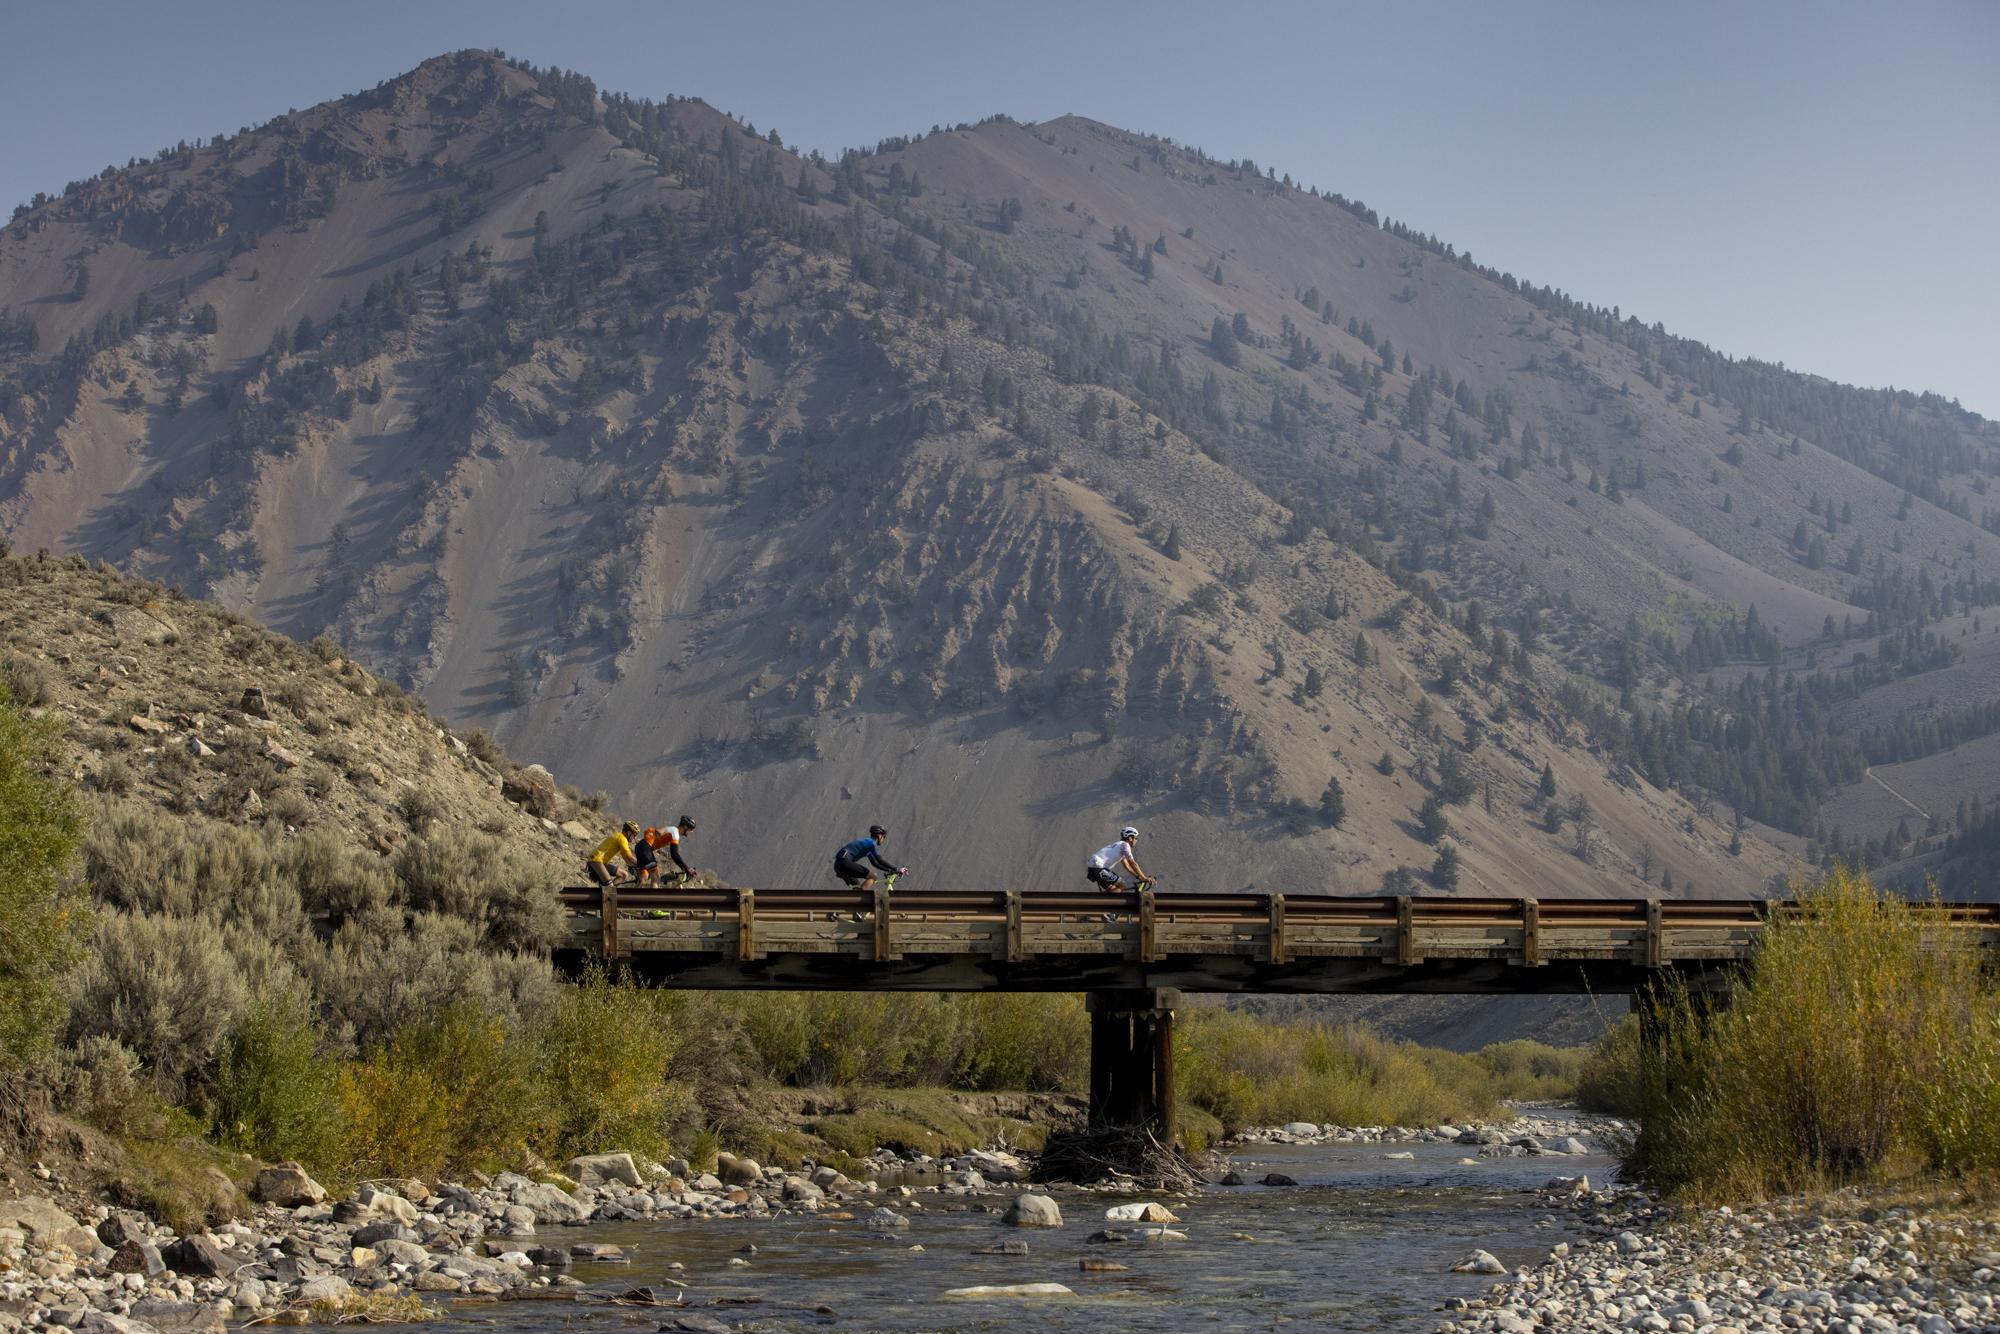 Photo by Wyatt Caldwell, courtesy Rebecca's Private Idaho